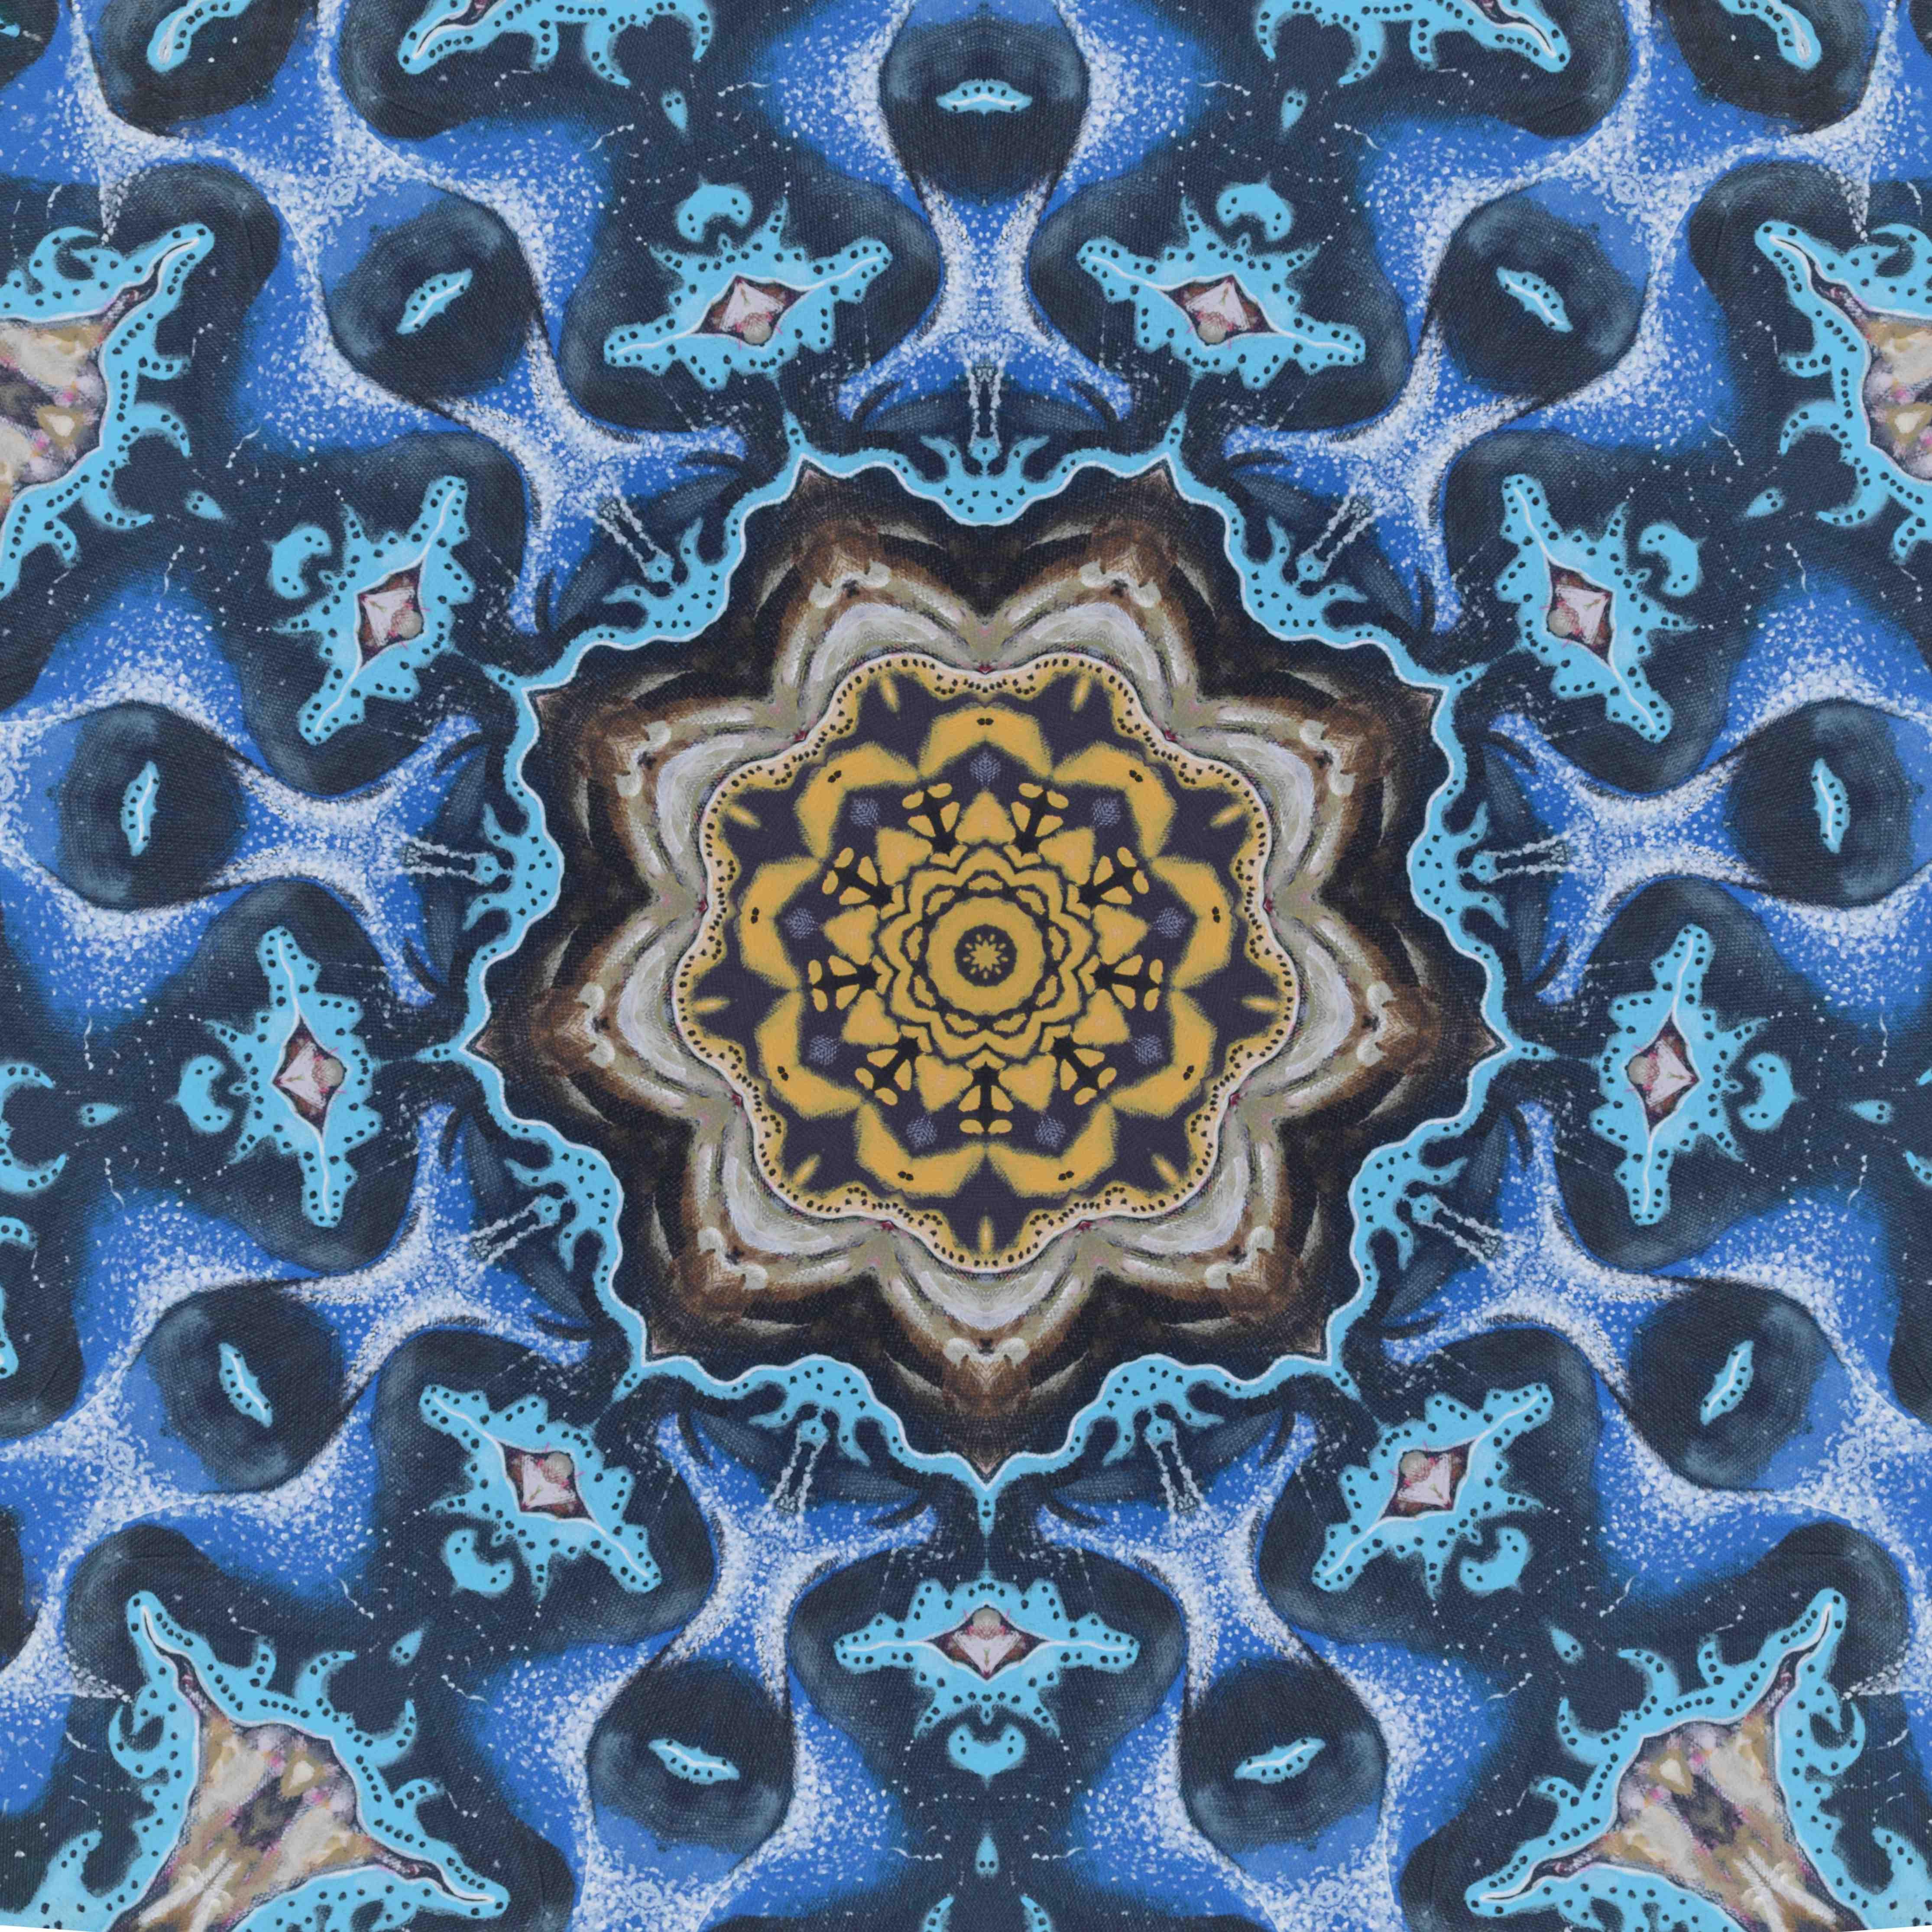 Fabric design GC #1_4i.jpg